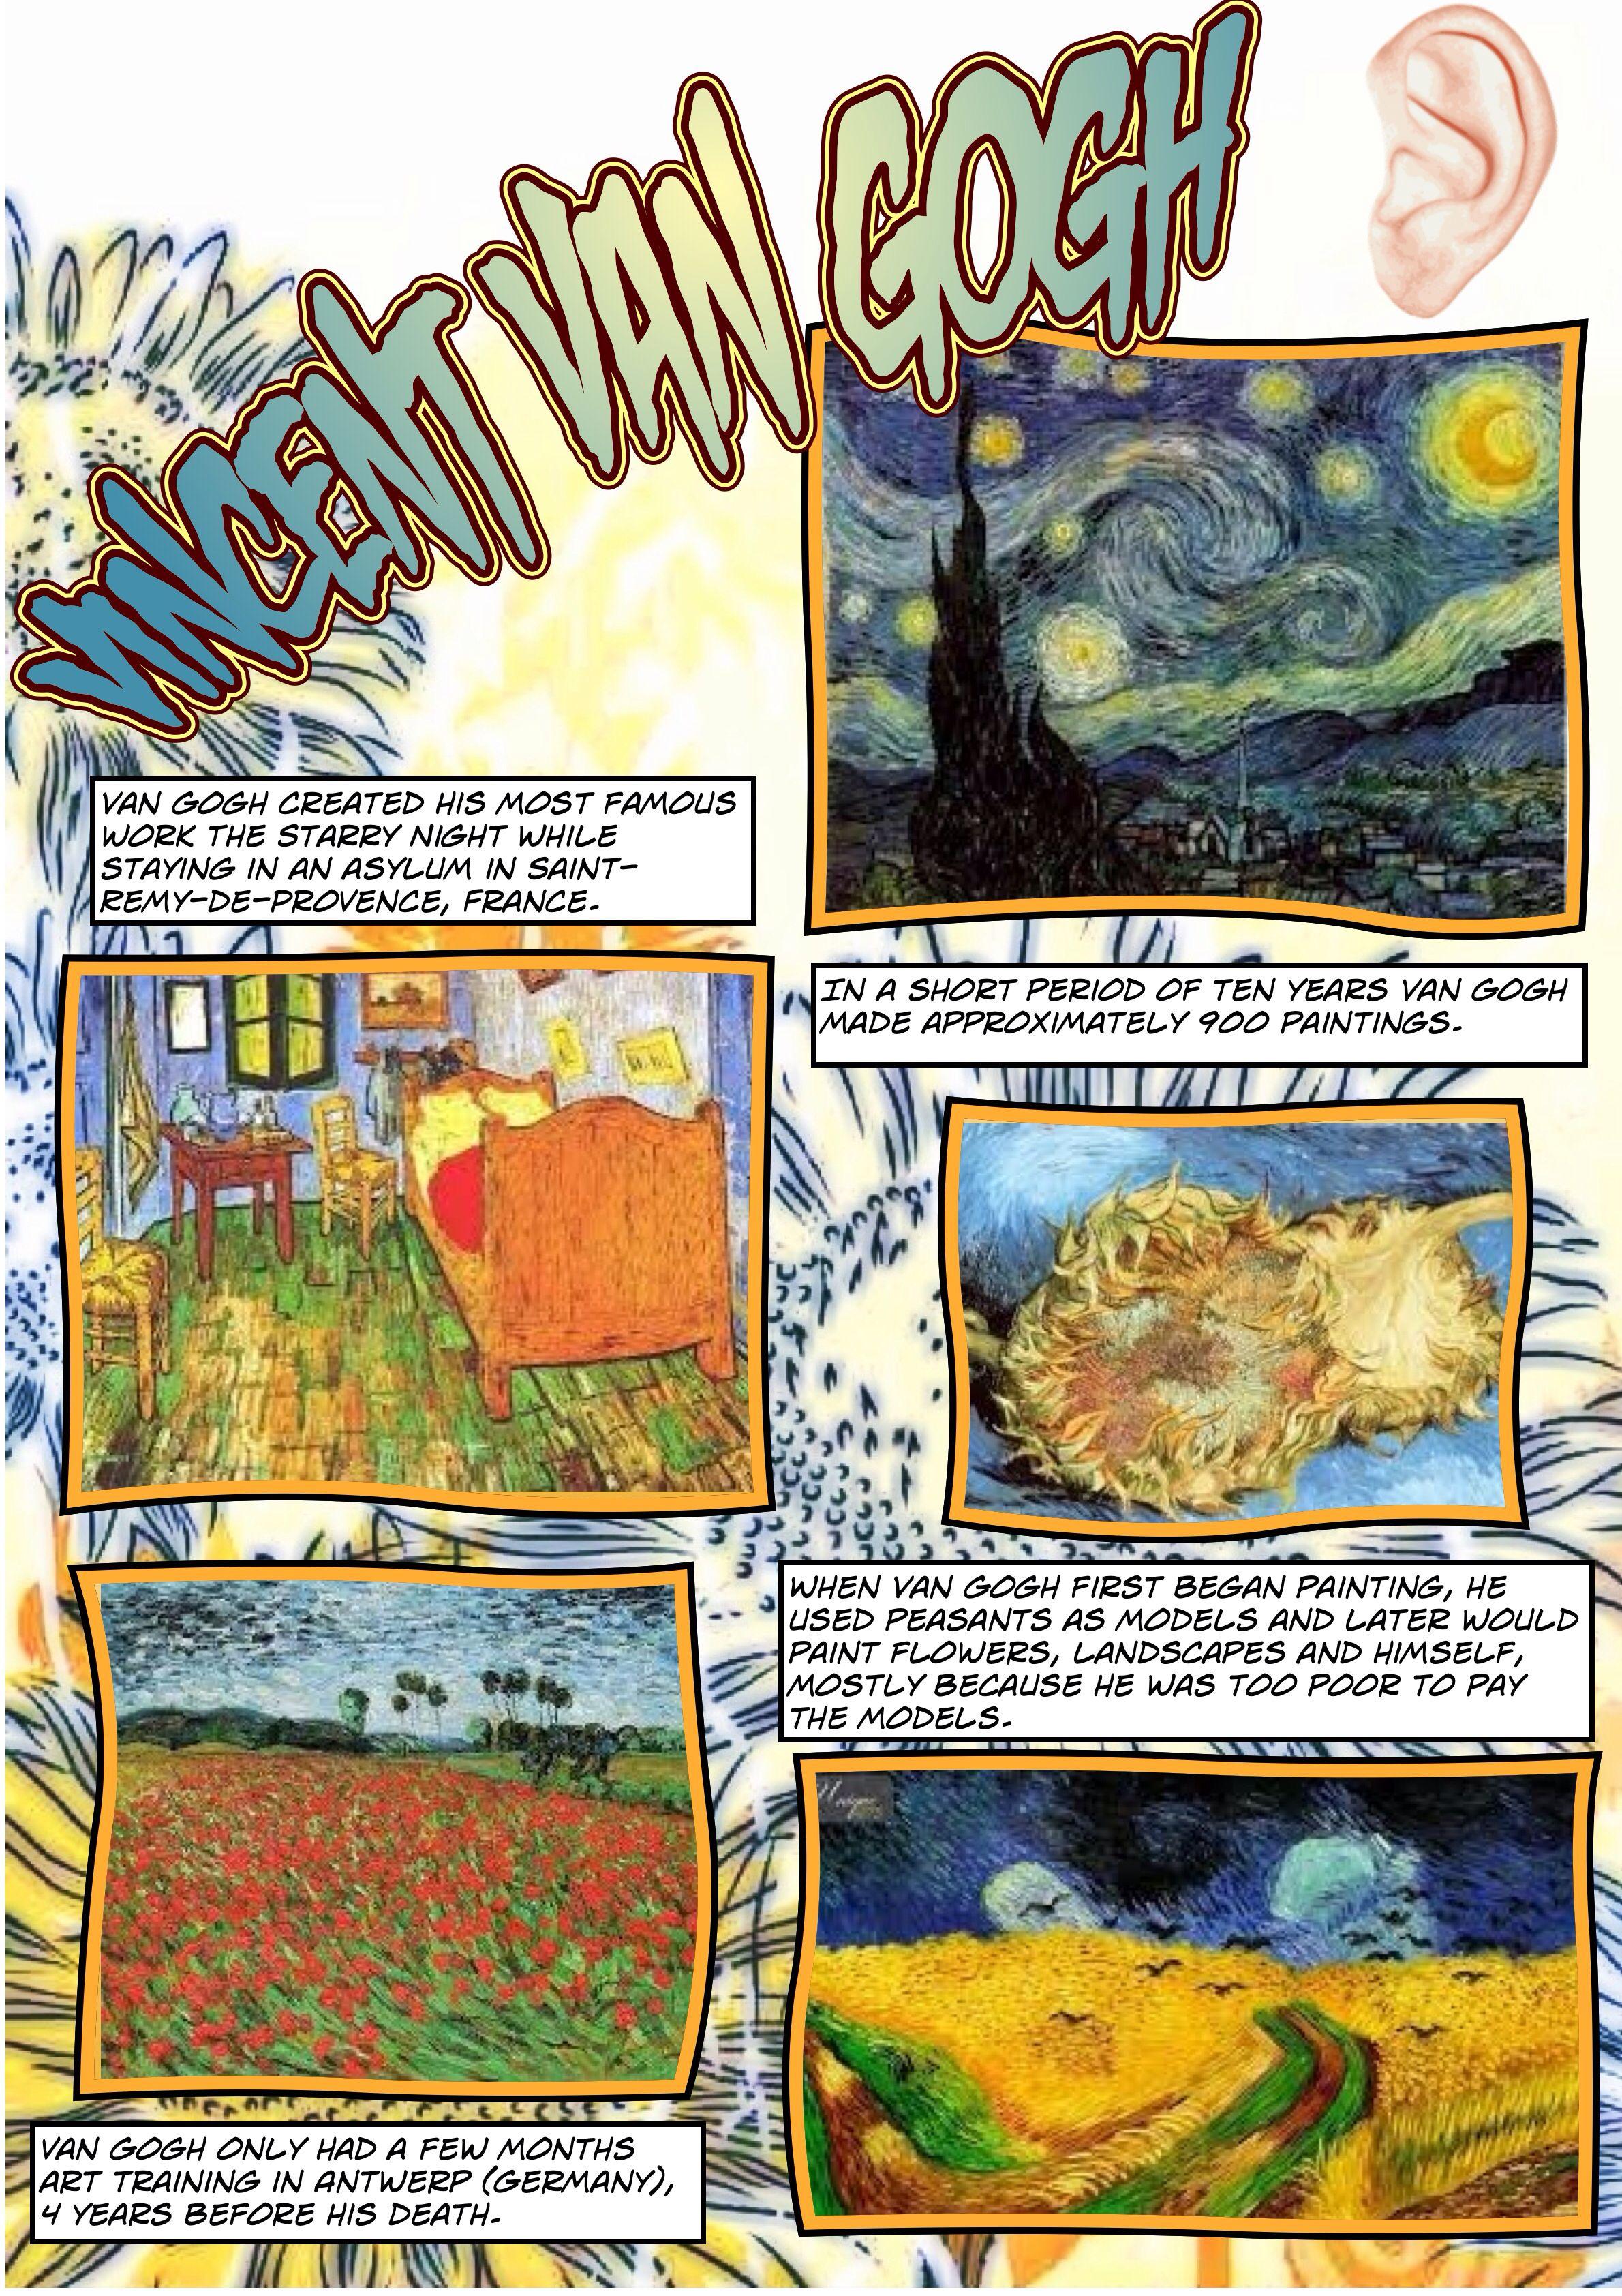 Vincent Van Gogh Artist Info Poster